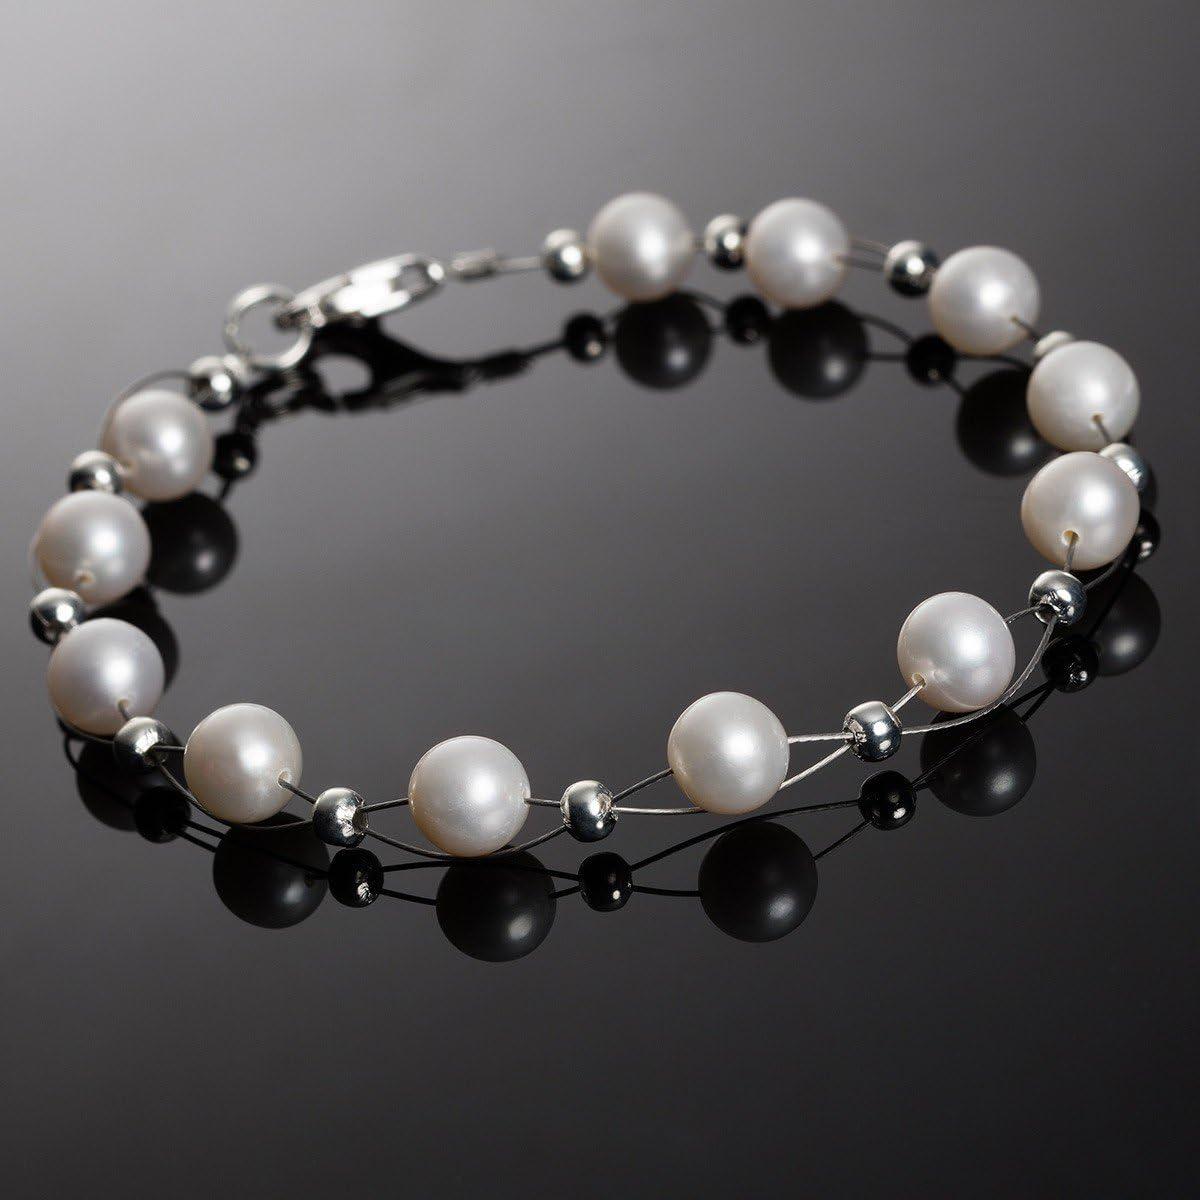 Perlenarmband elegant Armband aus echten Perlen Süßwasserperlen creme weiß